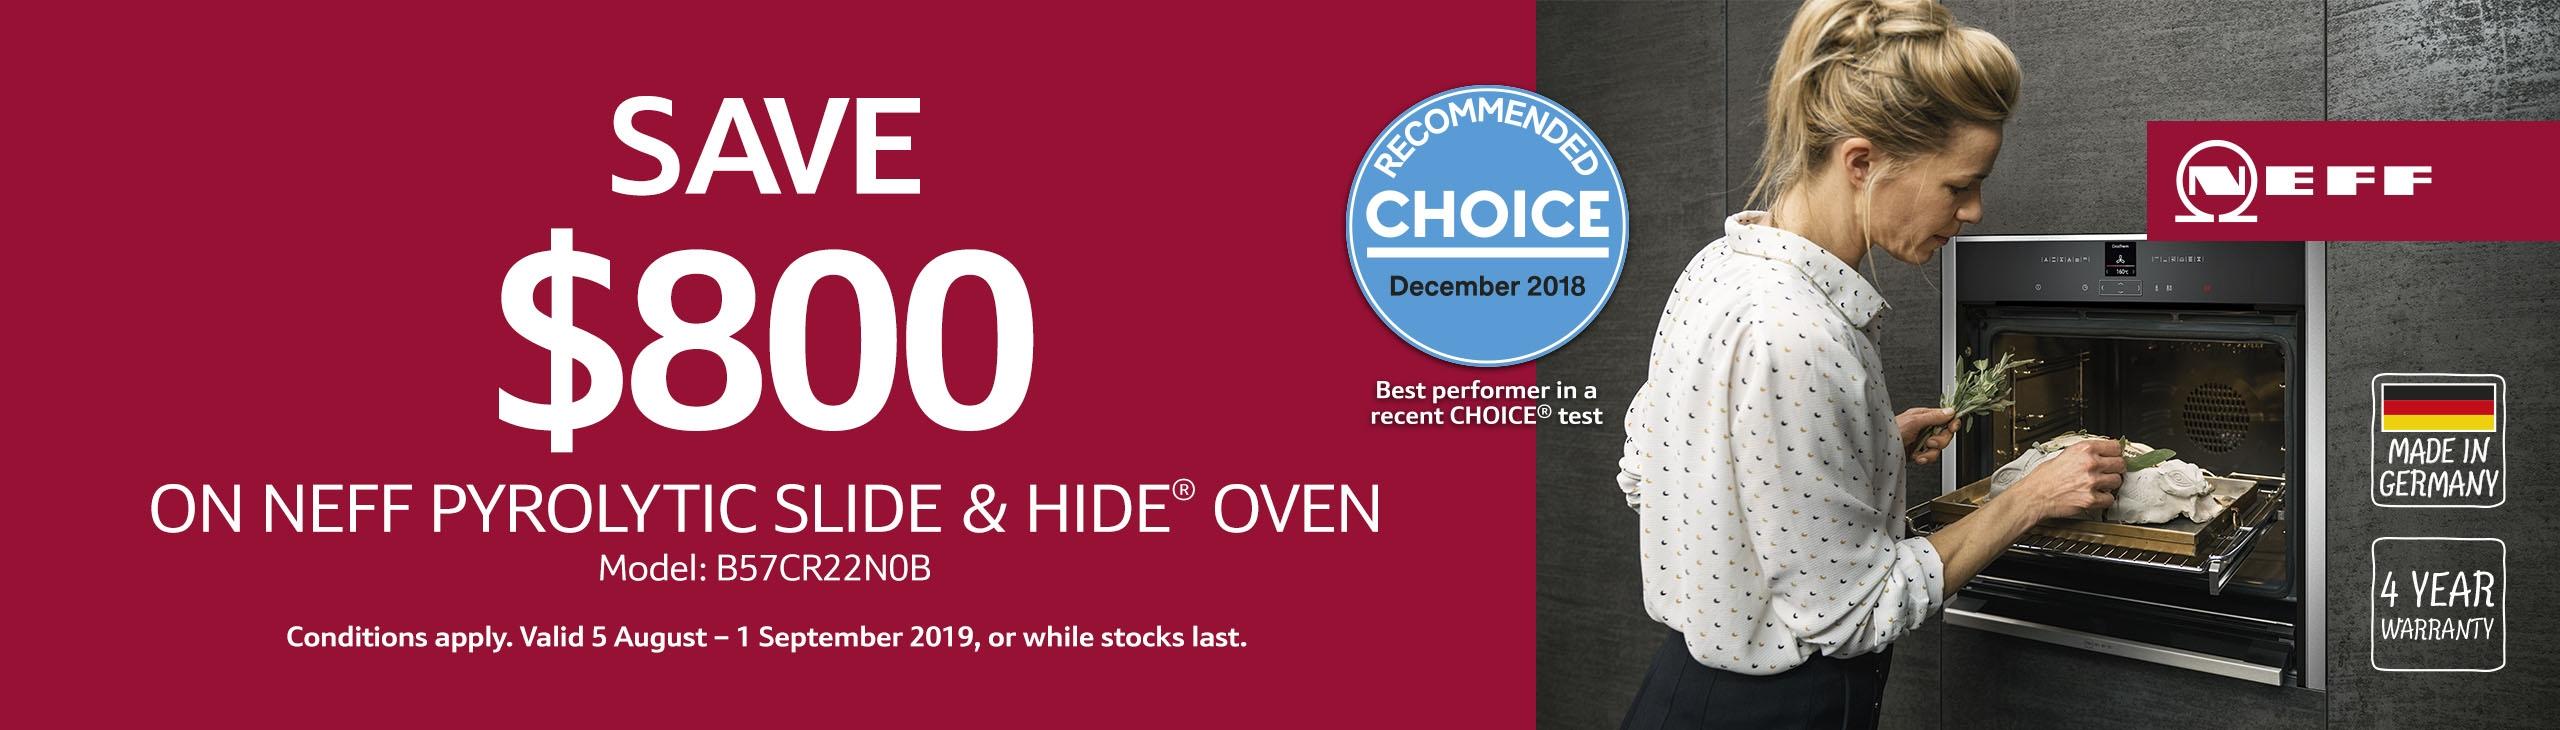 Save Upto $800 on Neff Oven